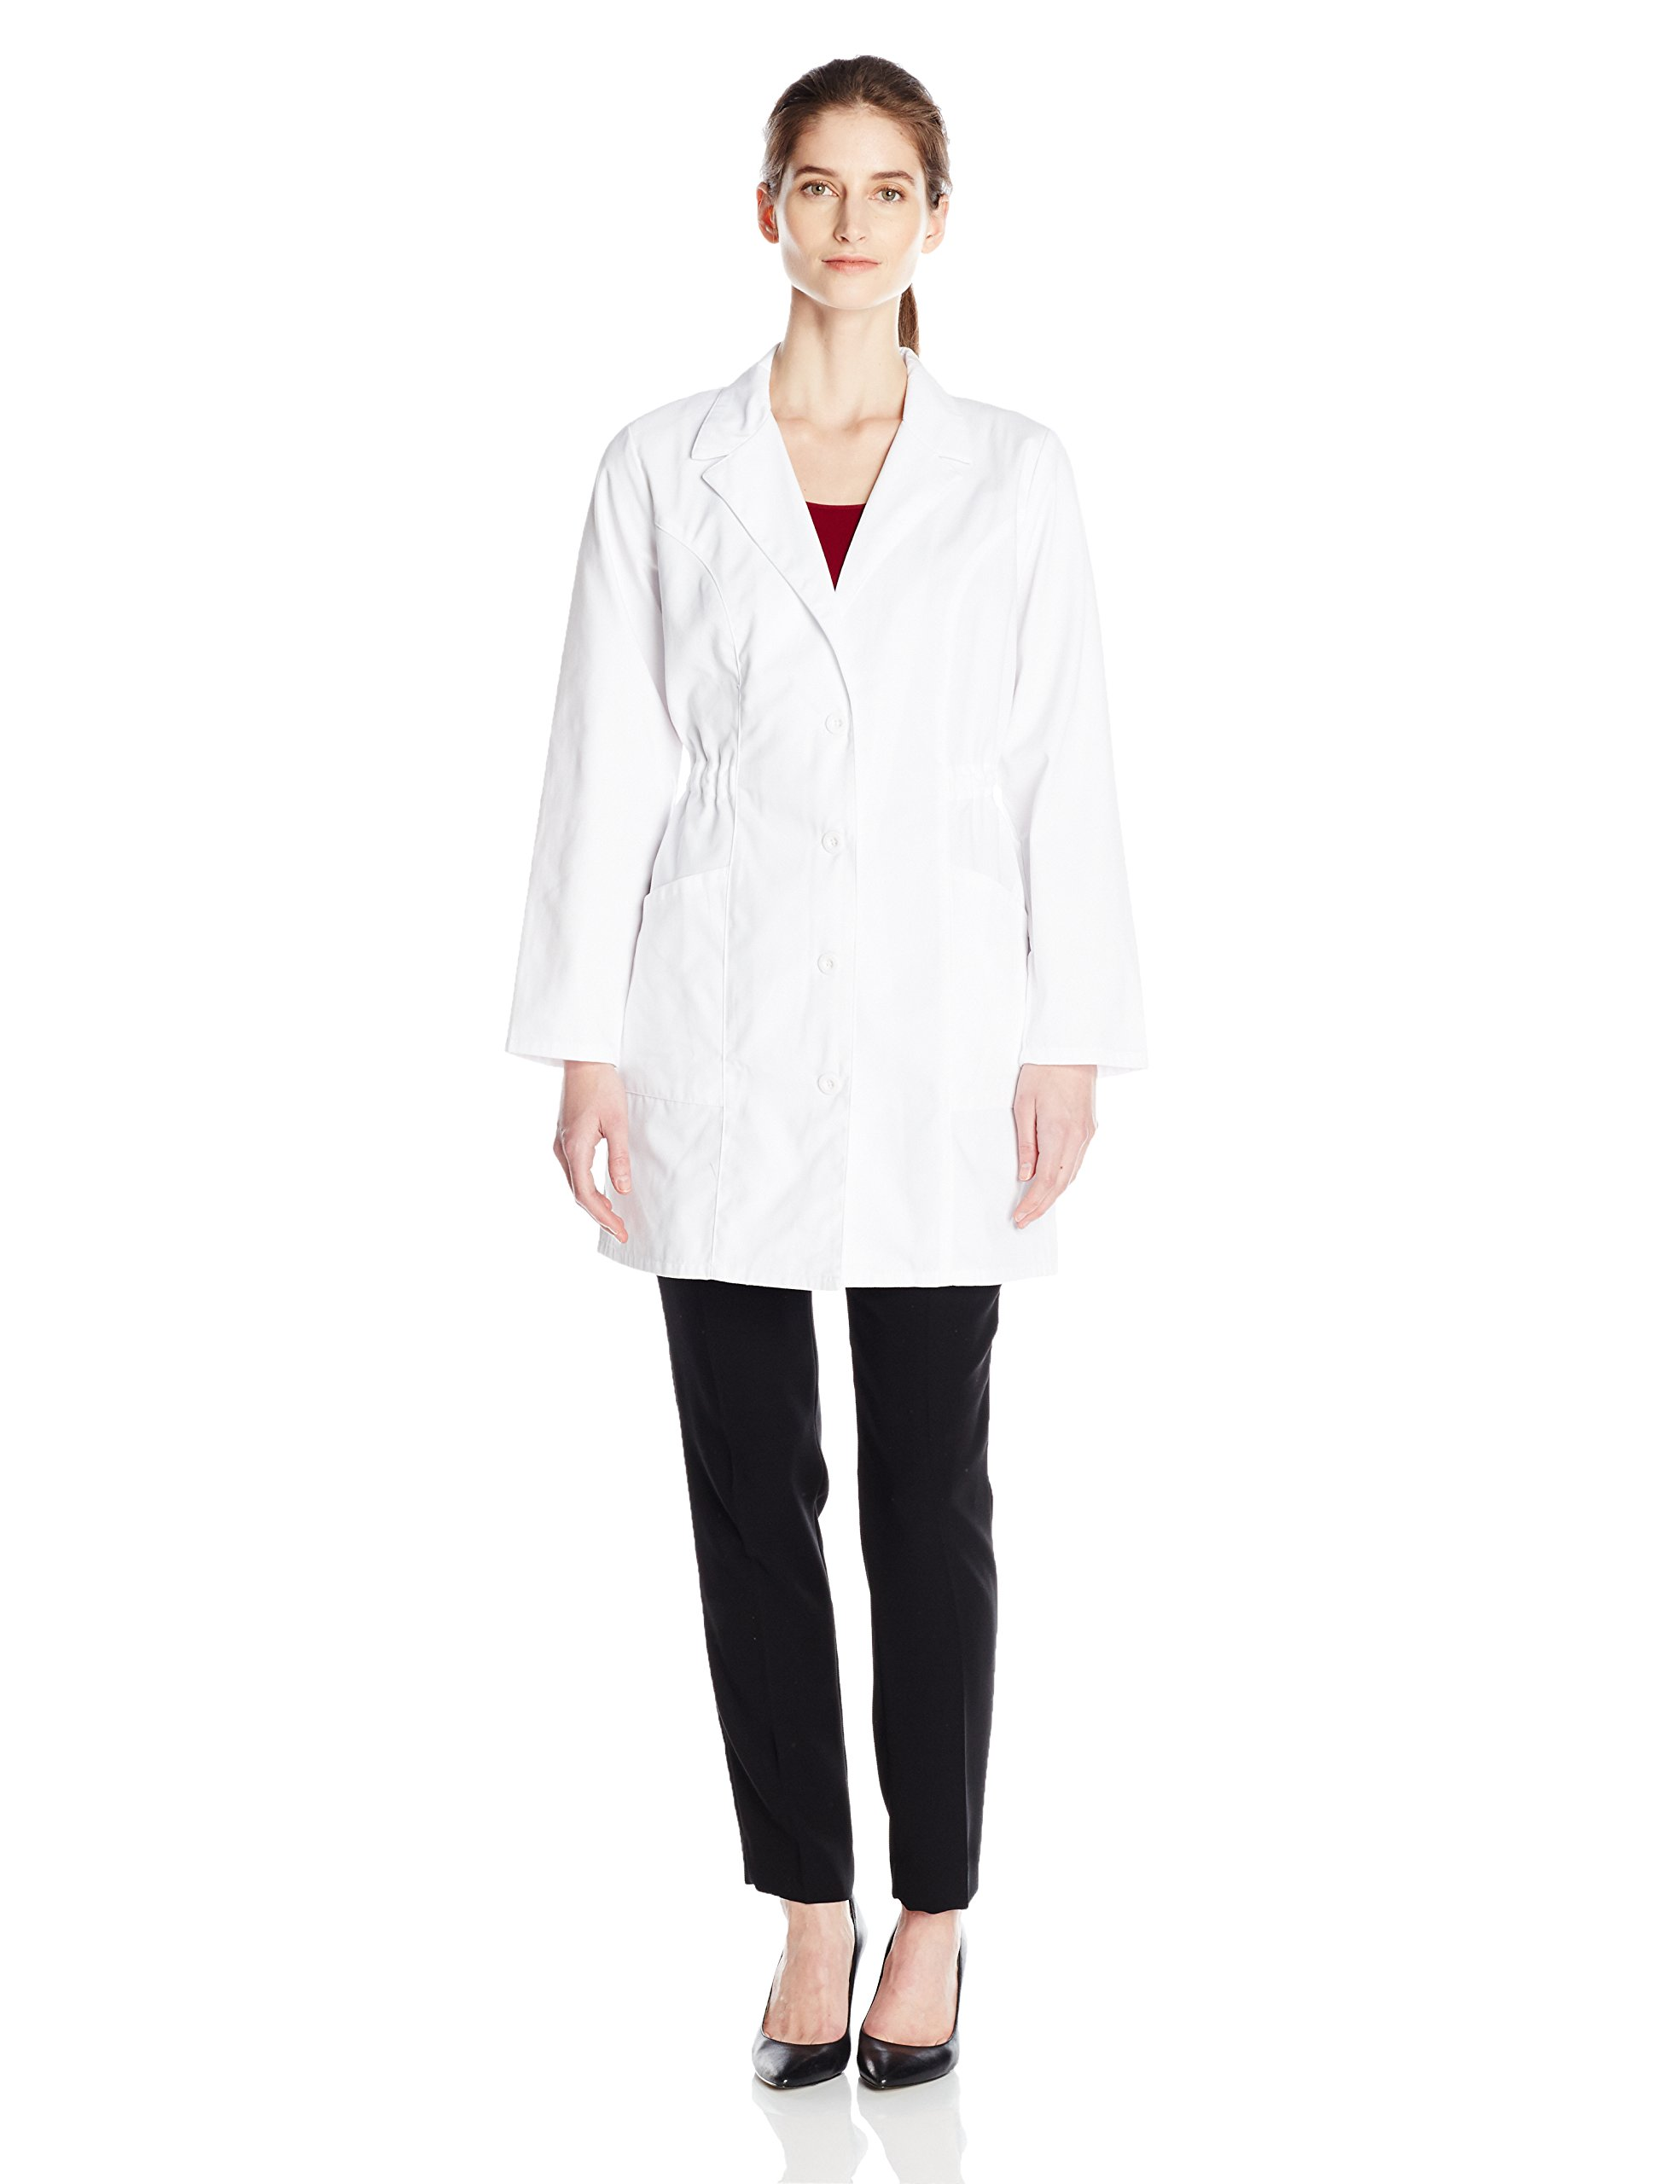 Dickies Women's 34 Inch Lab Coat, White, X-Small